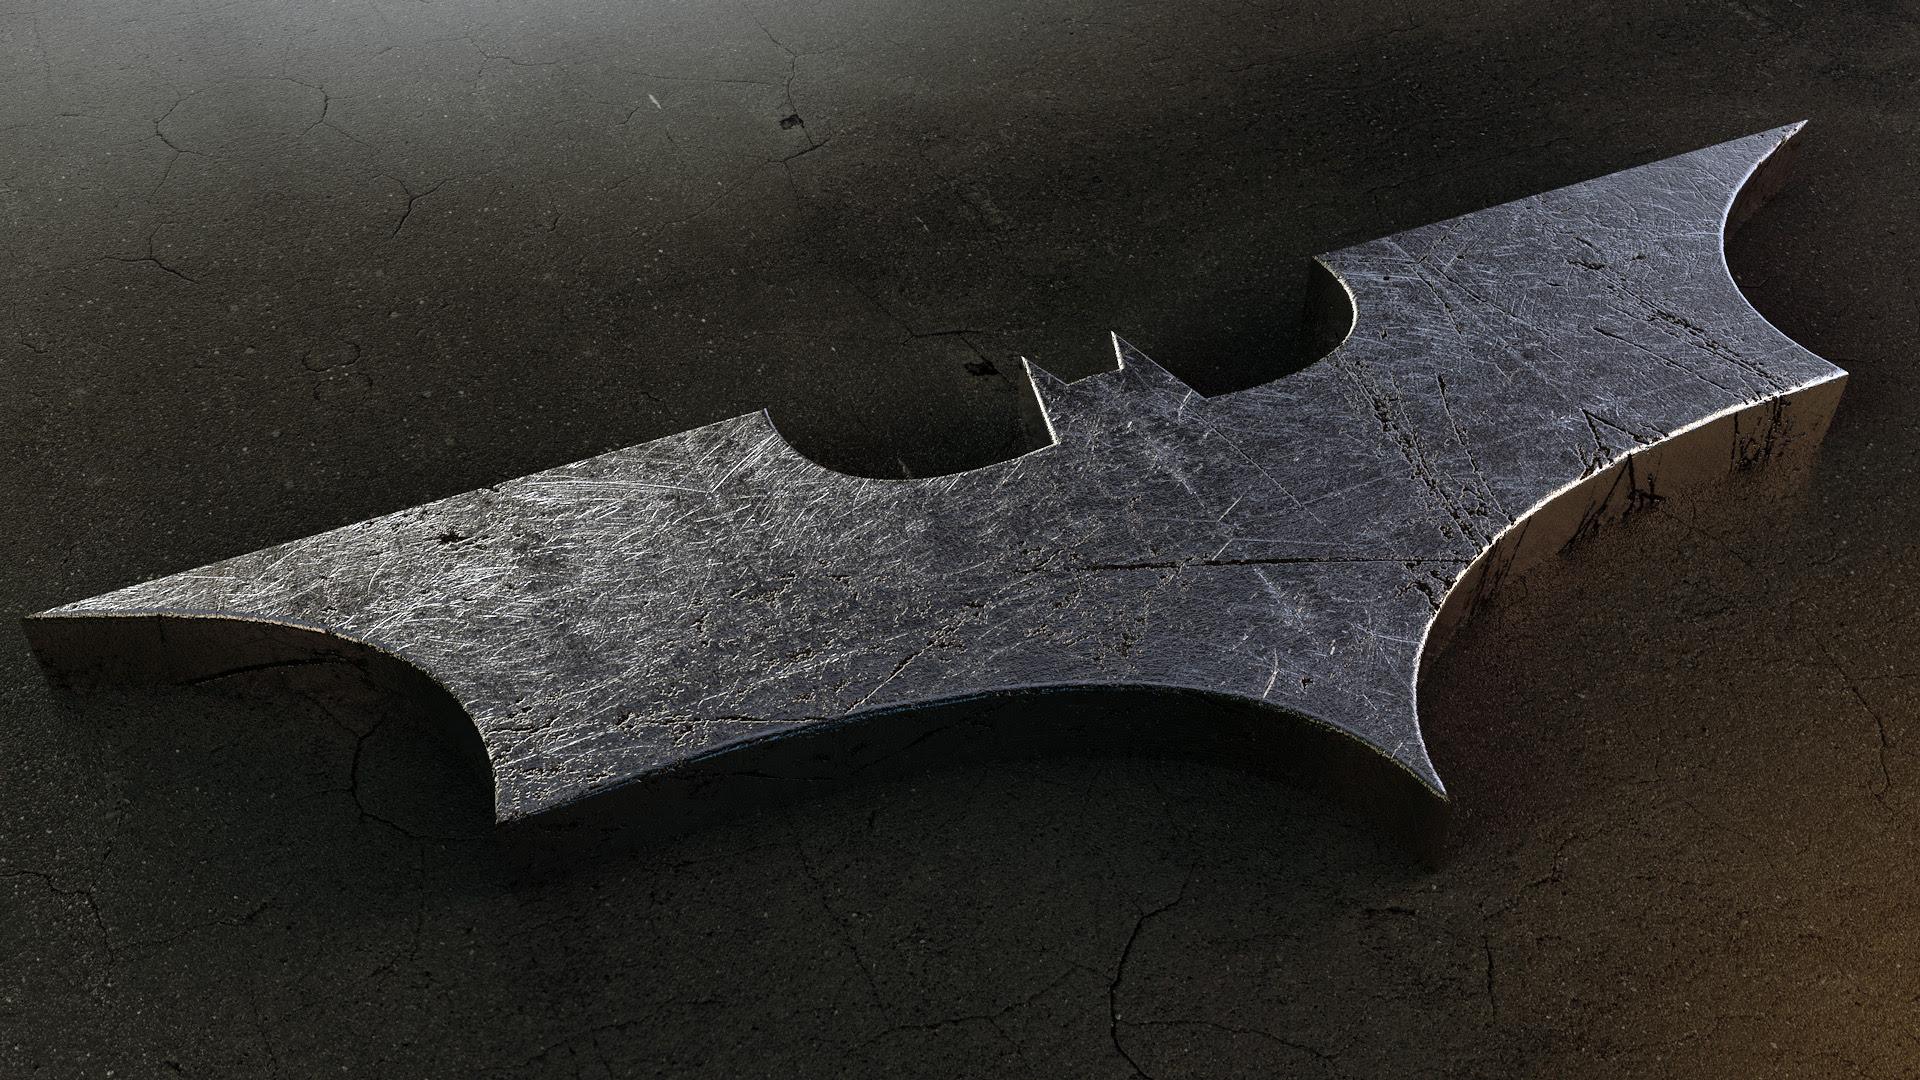 batman logo wallpaper for desktop 1080p 12